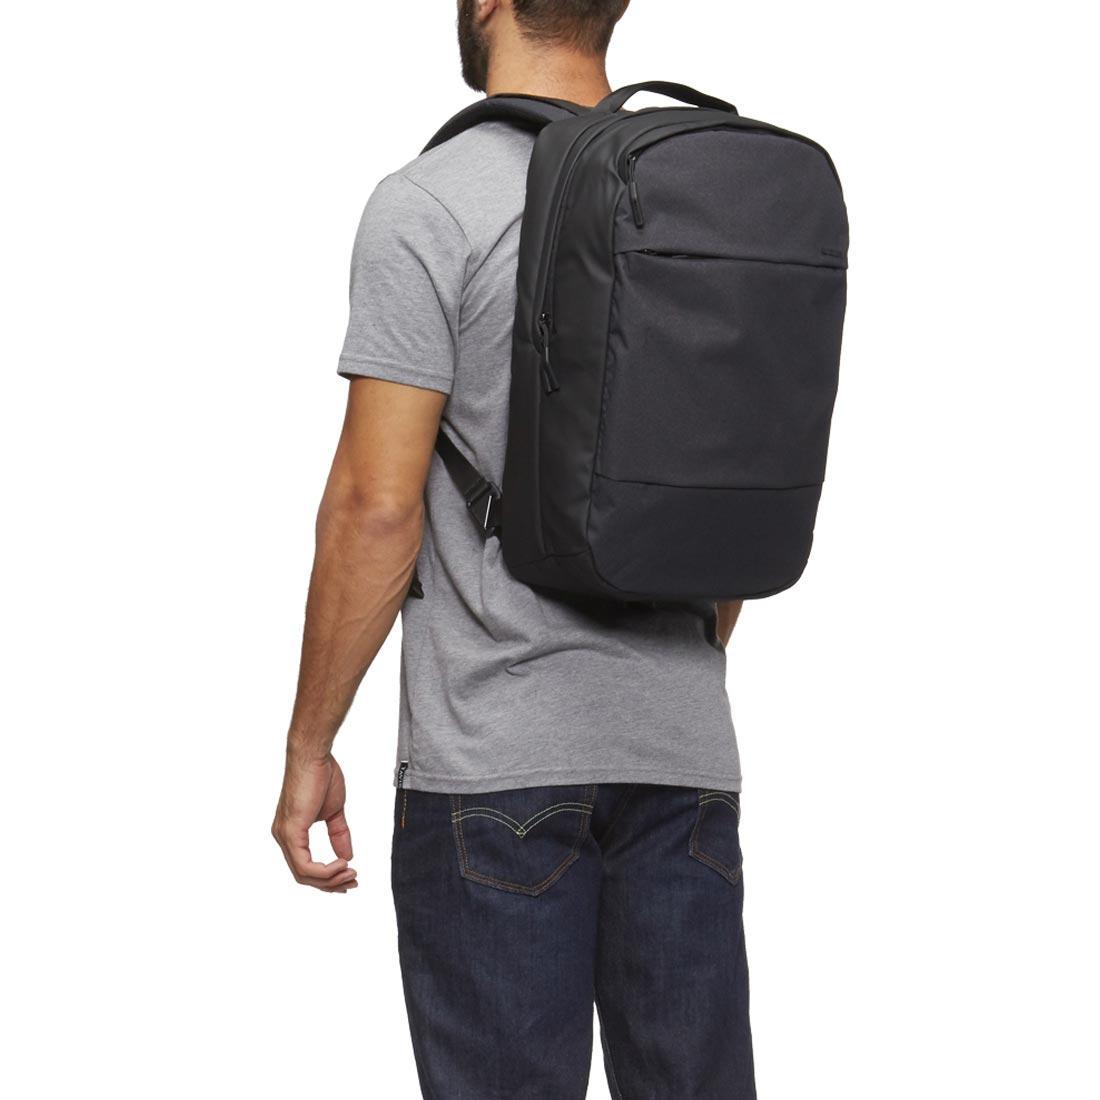 534b4109b3ea Incase City Compact 17.5L Backpack - Black